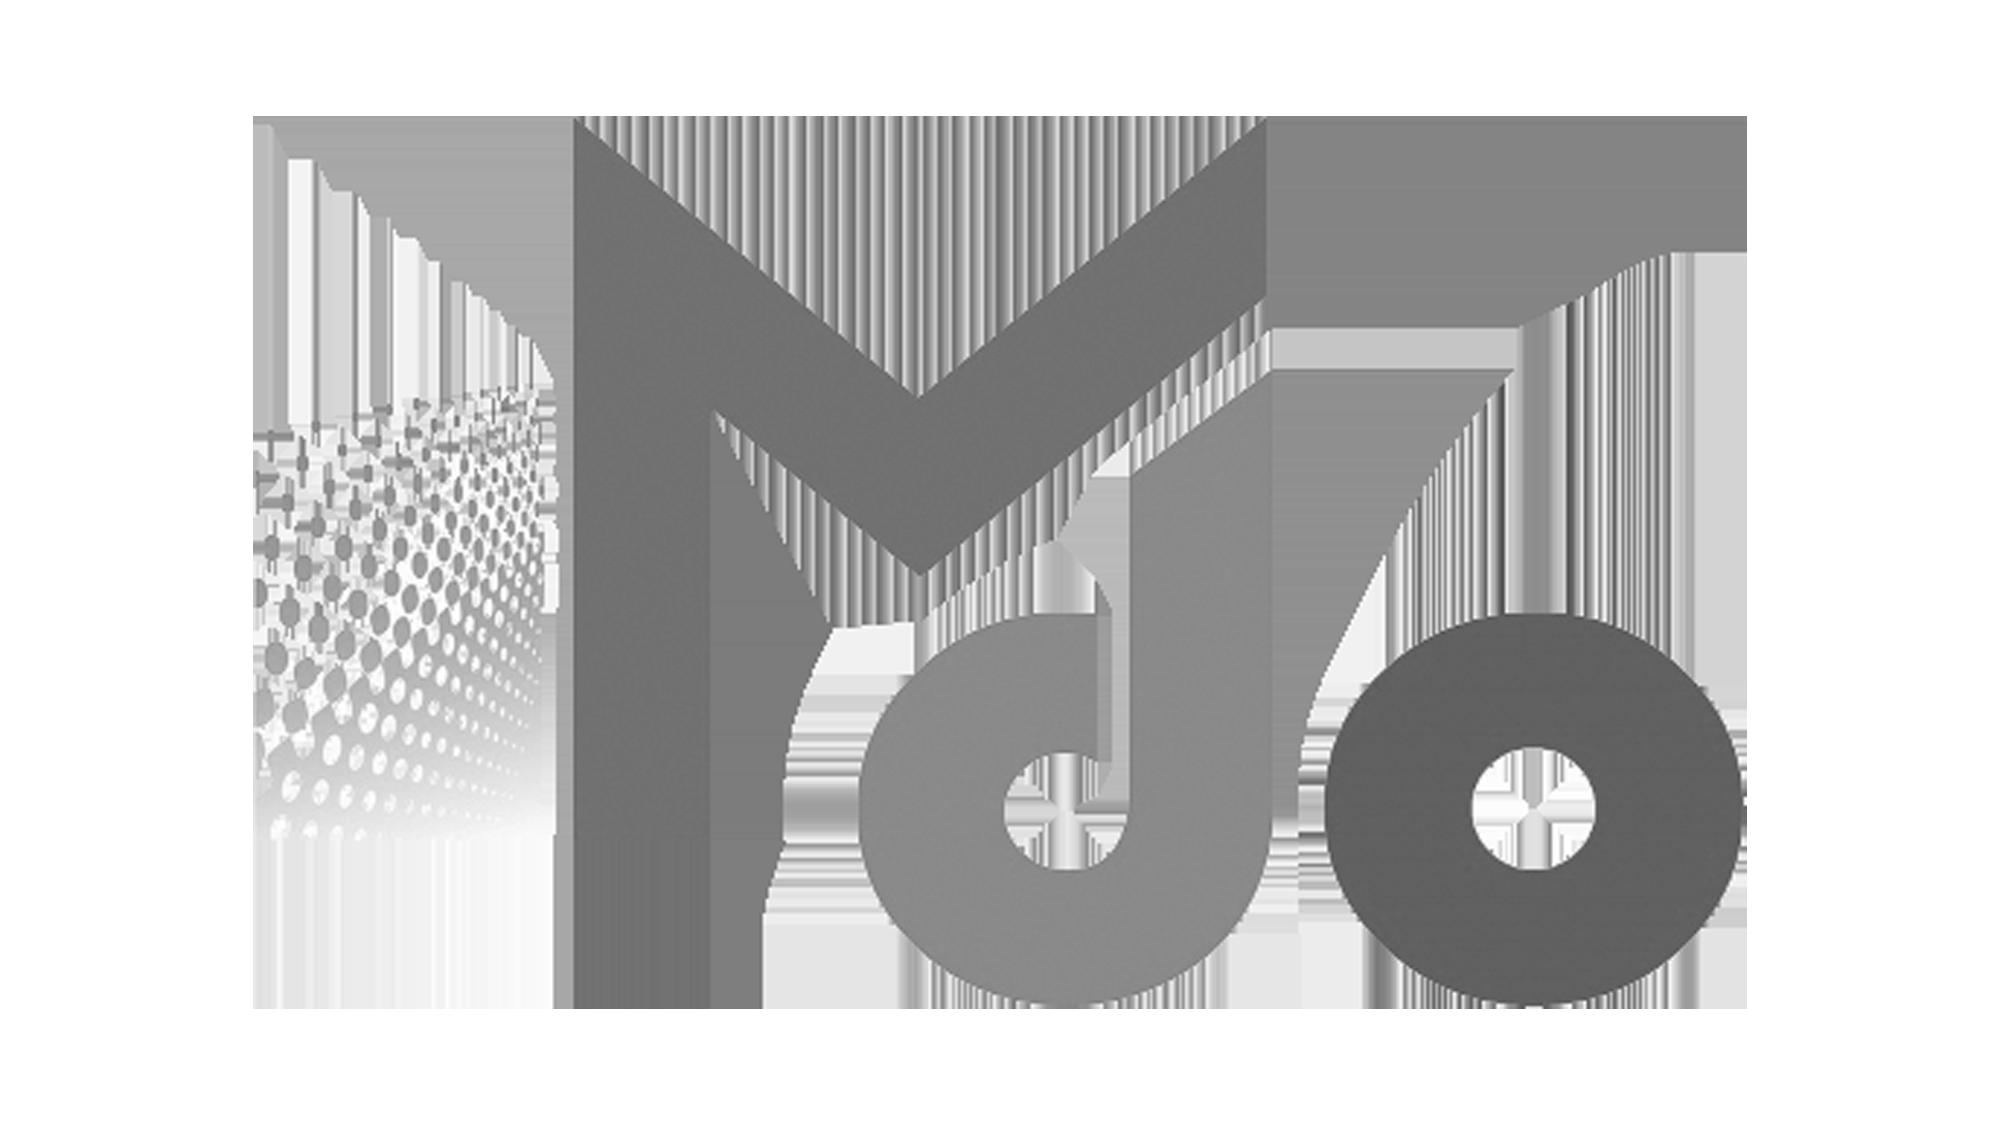 logo_3 ivan rizzitano